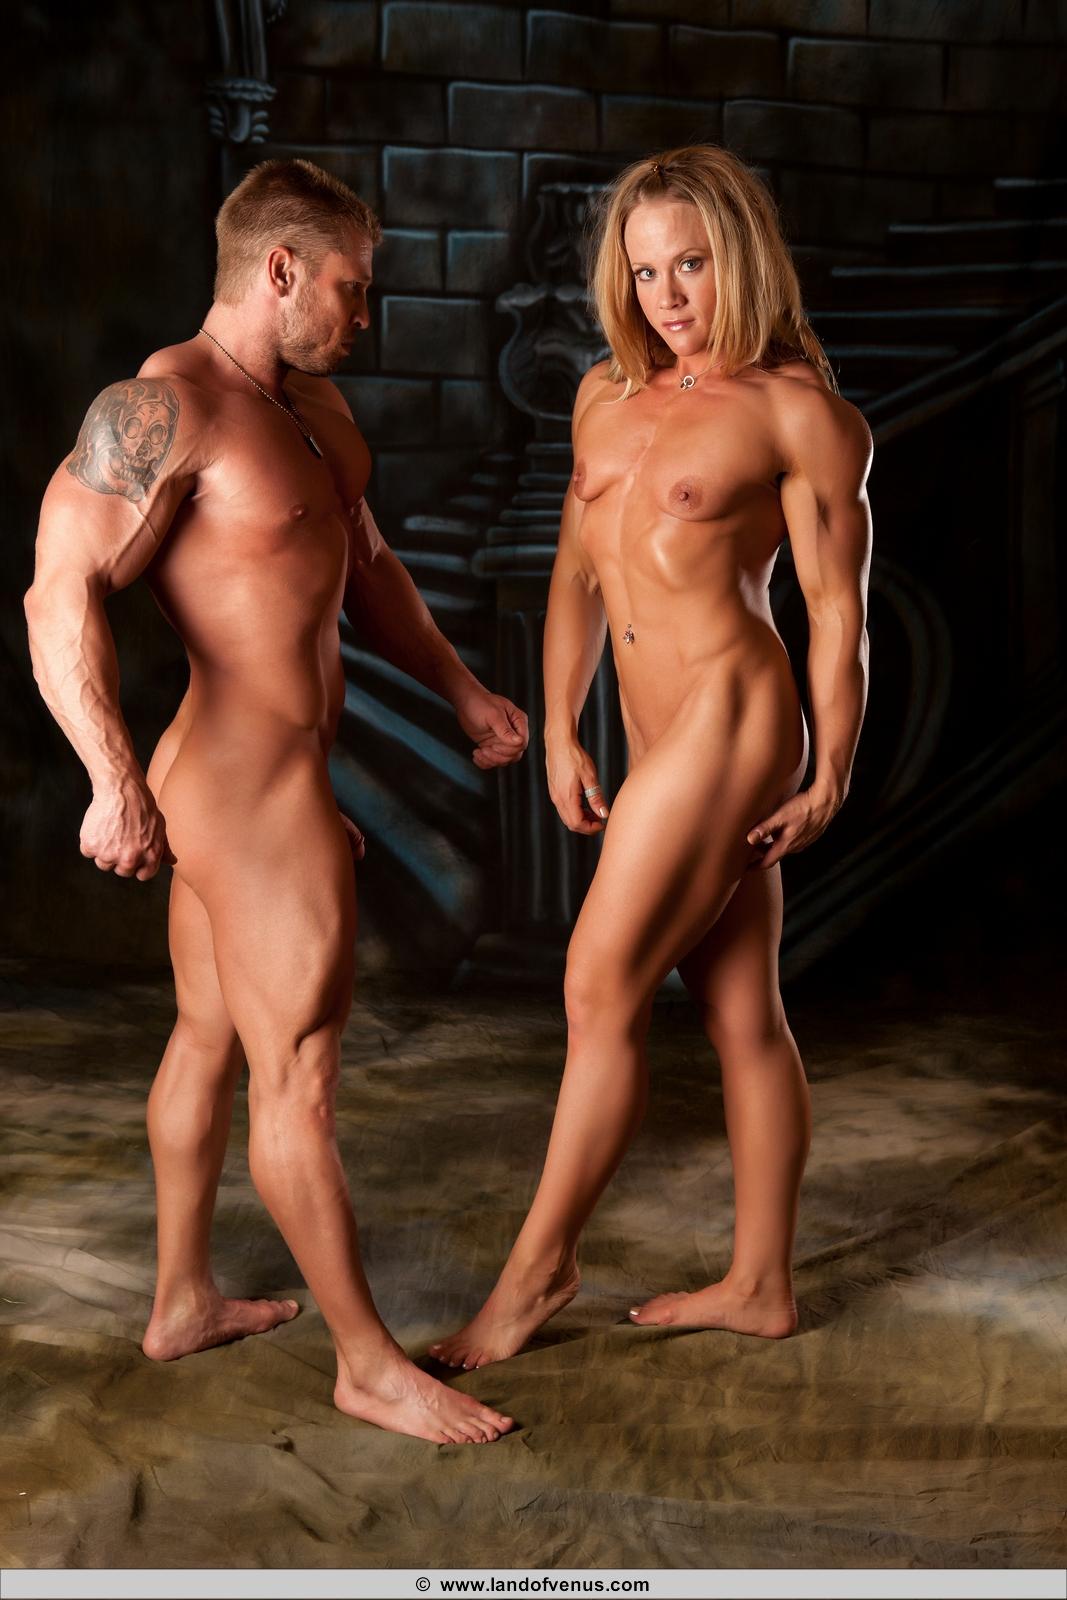 Where you nude female bodybuilder amanda